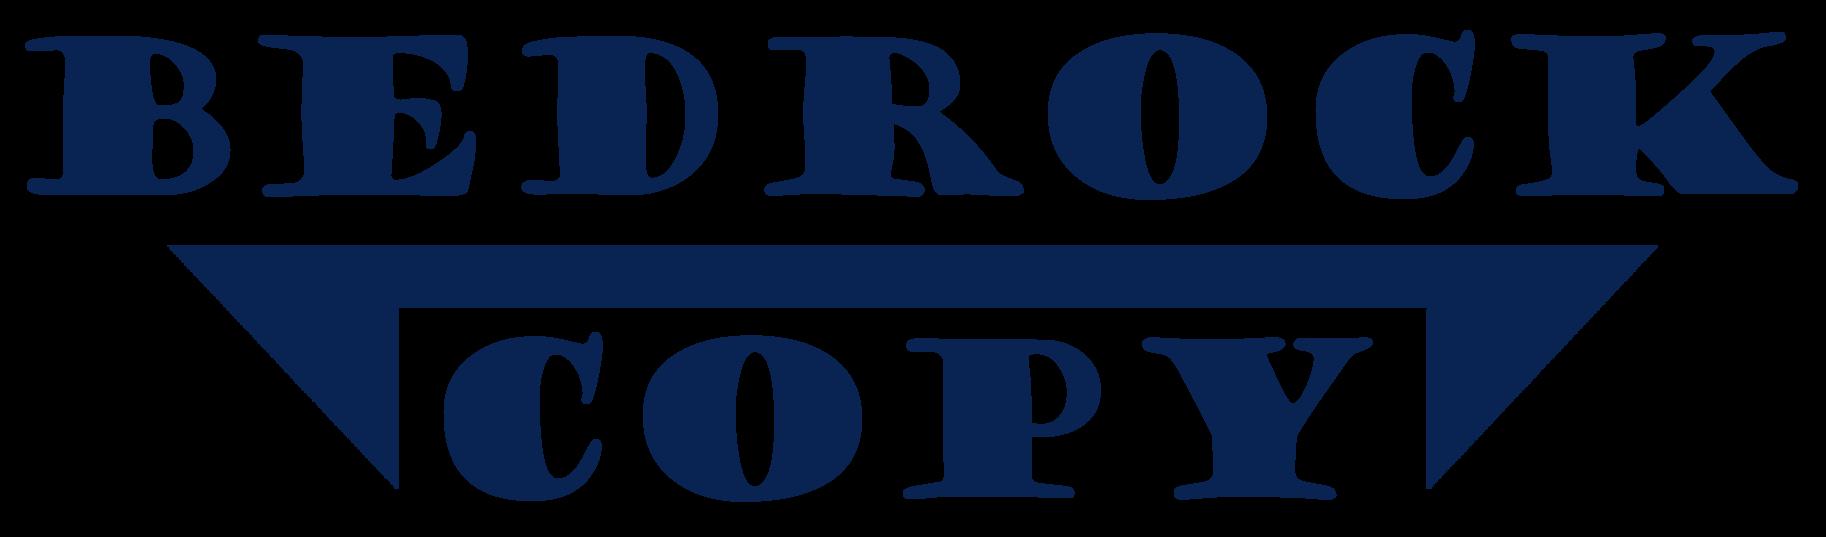 Bedrock Copy